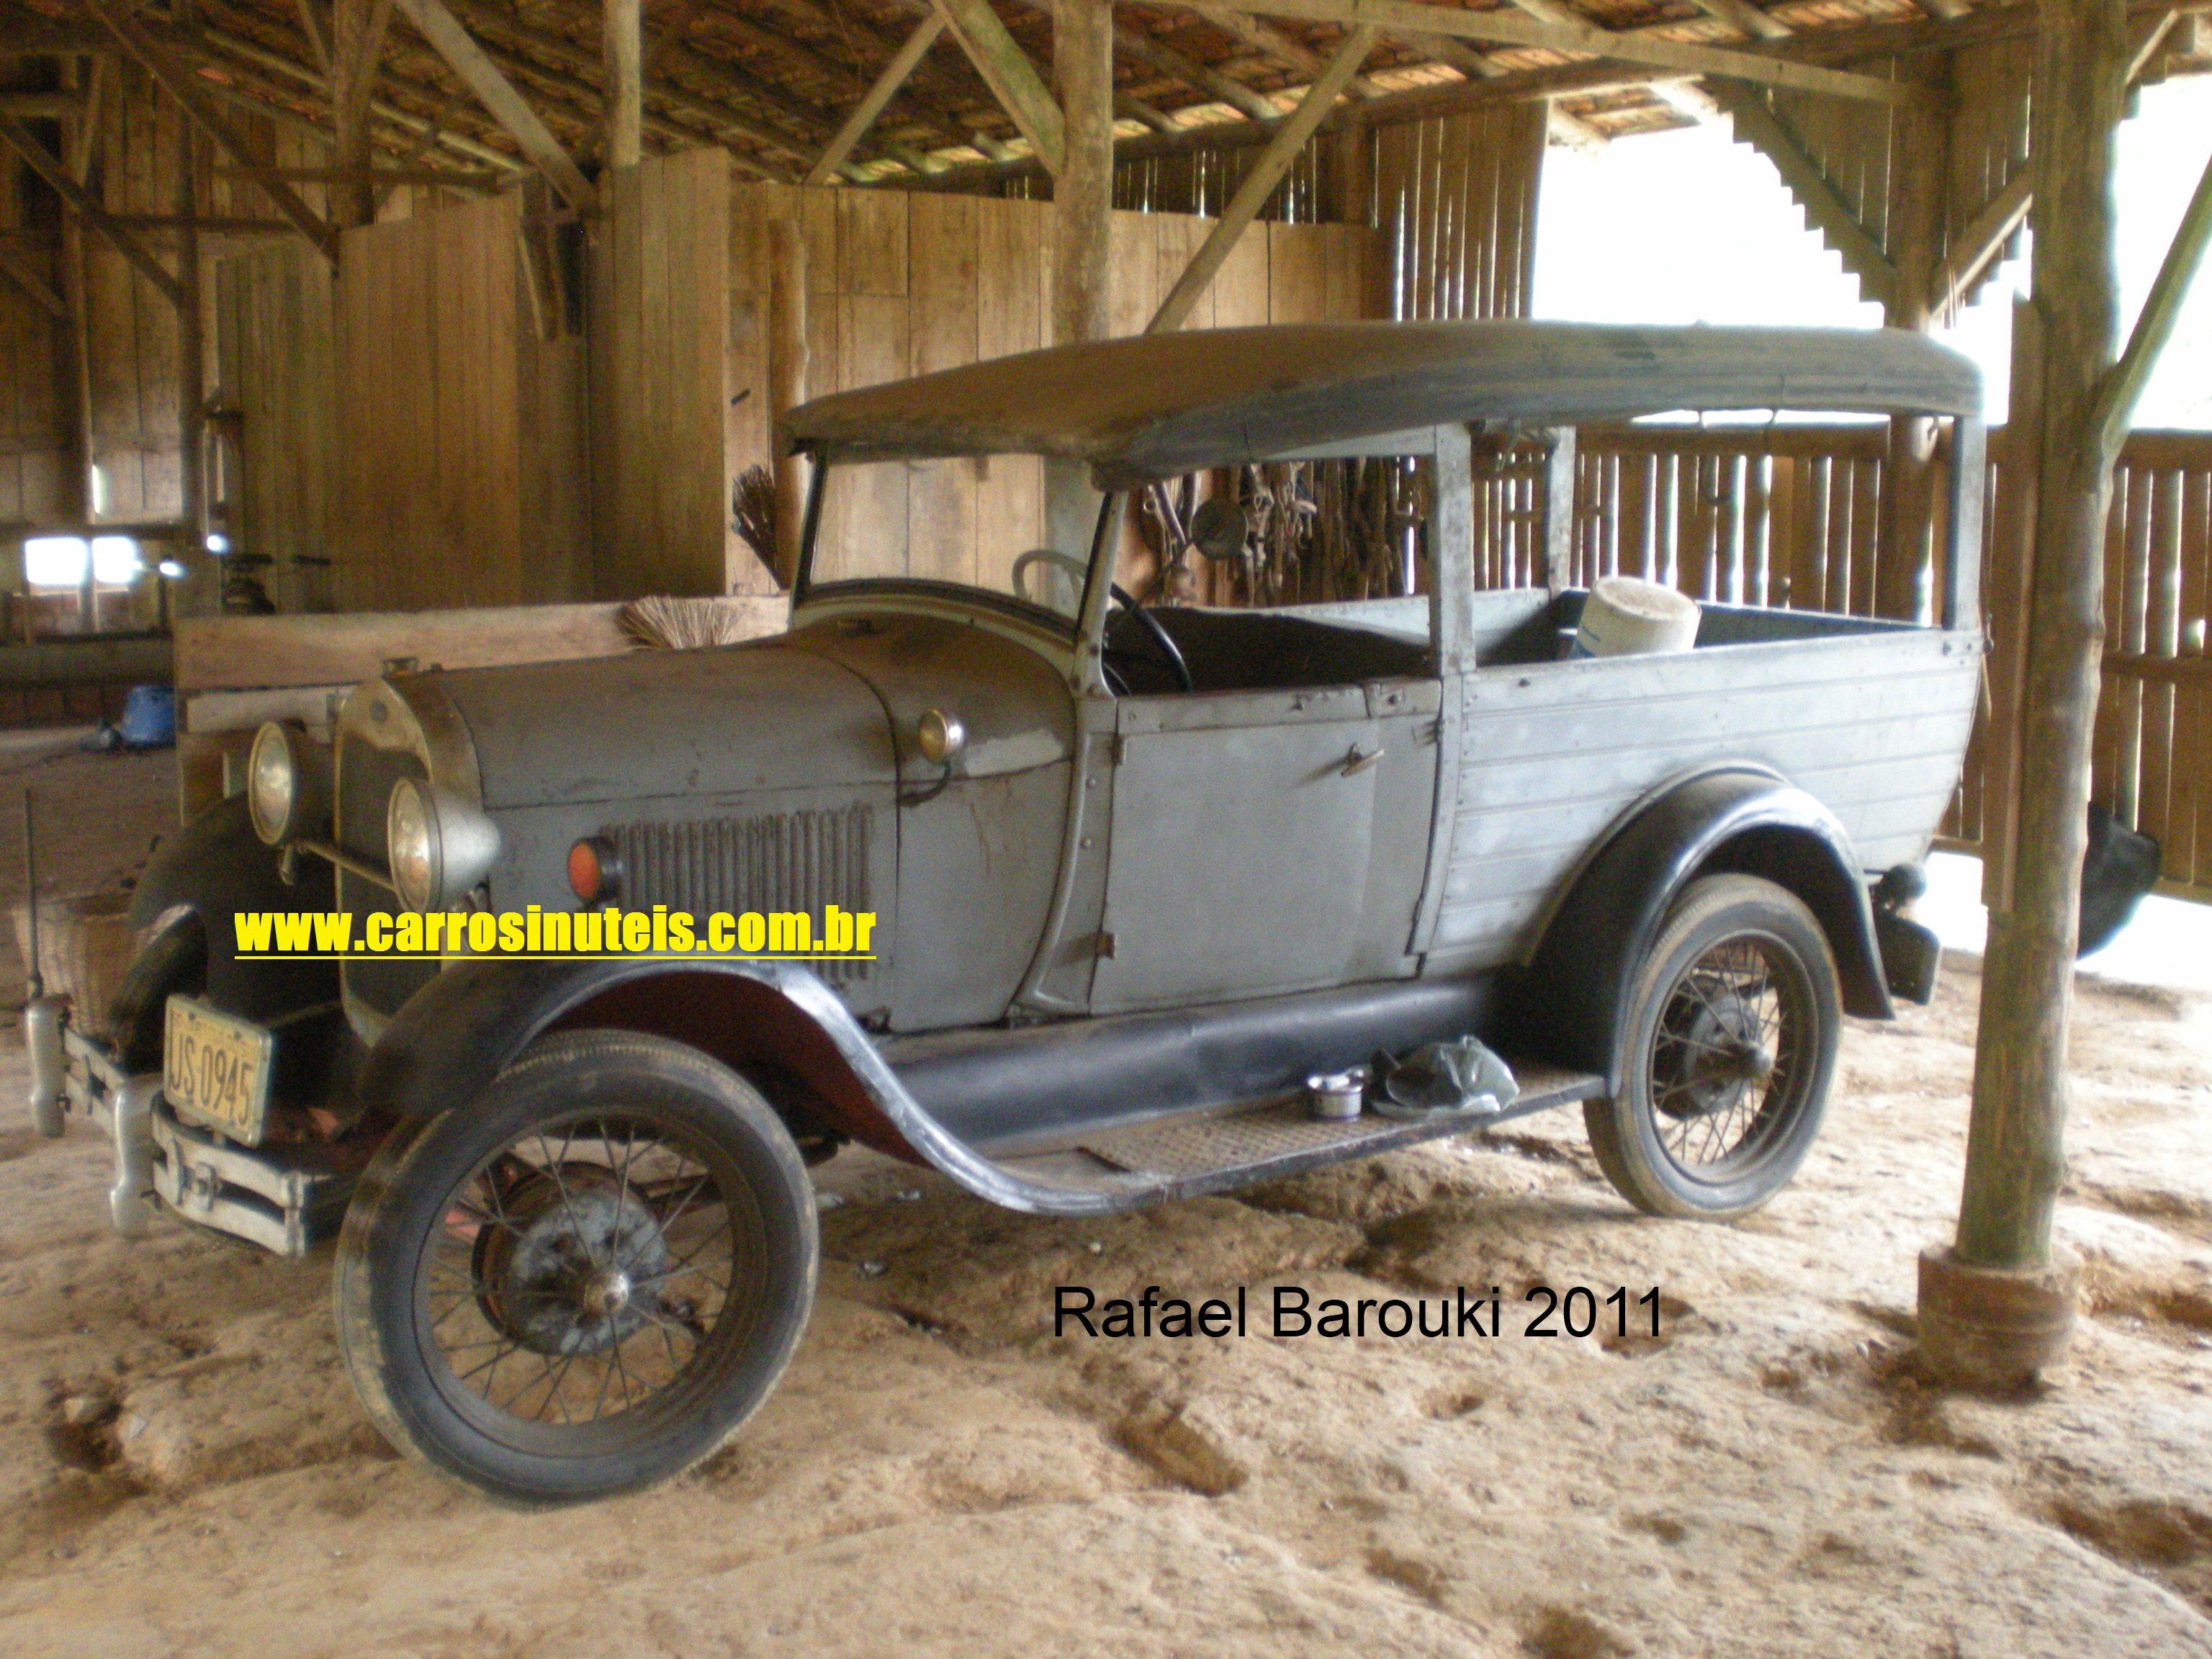 Ford-A-1929-Pomerode-Rafael-Barouki-3 Ford A 1929